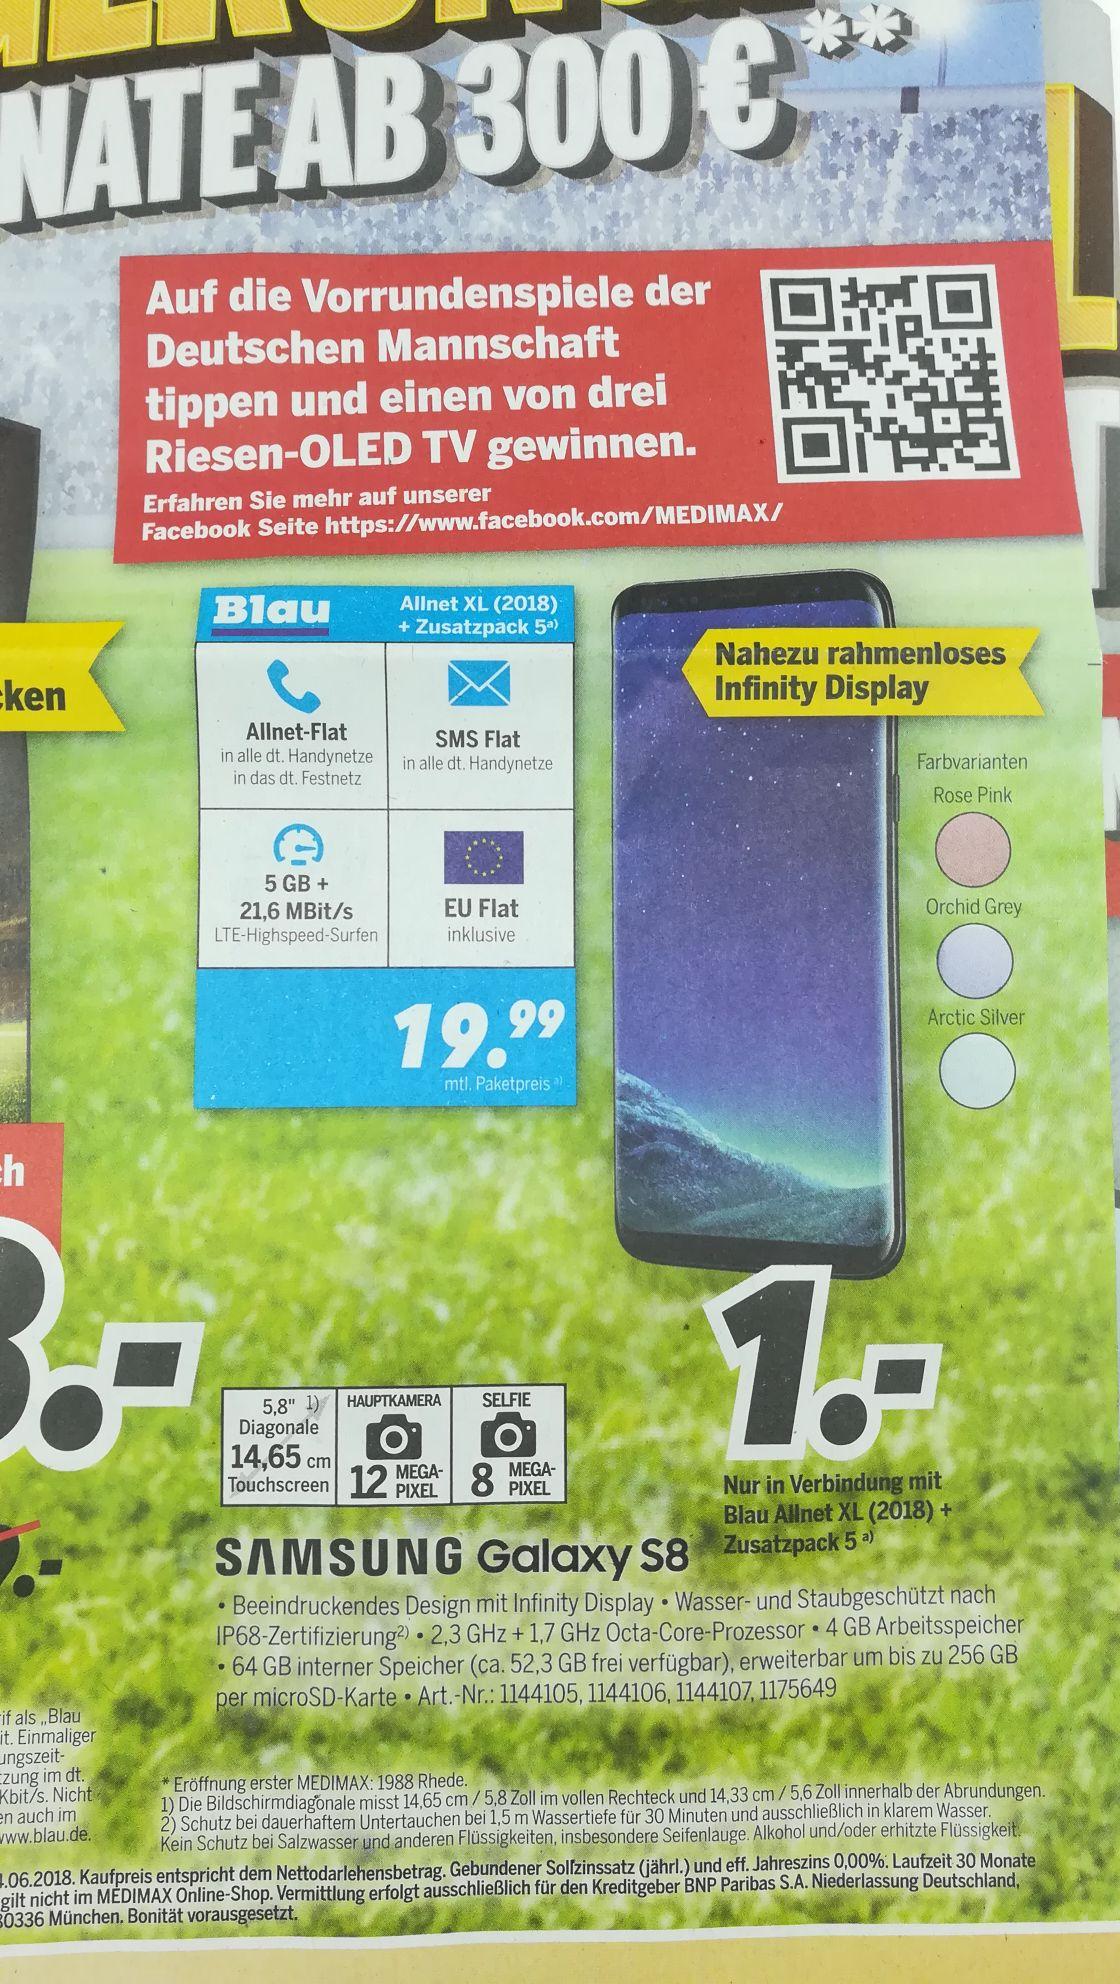 [Lokal] 5 GB LTE + Telefonie&SMS Flat für effektiv 6,90€ mtl.